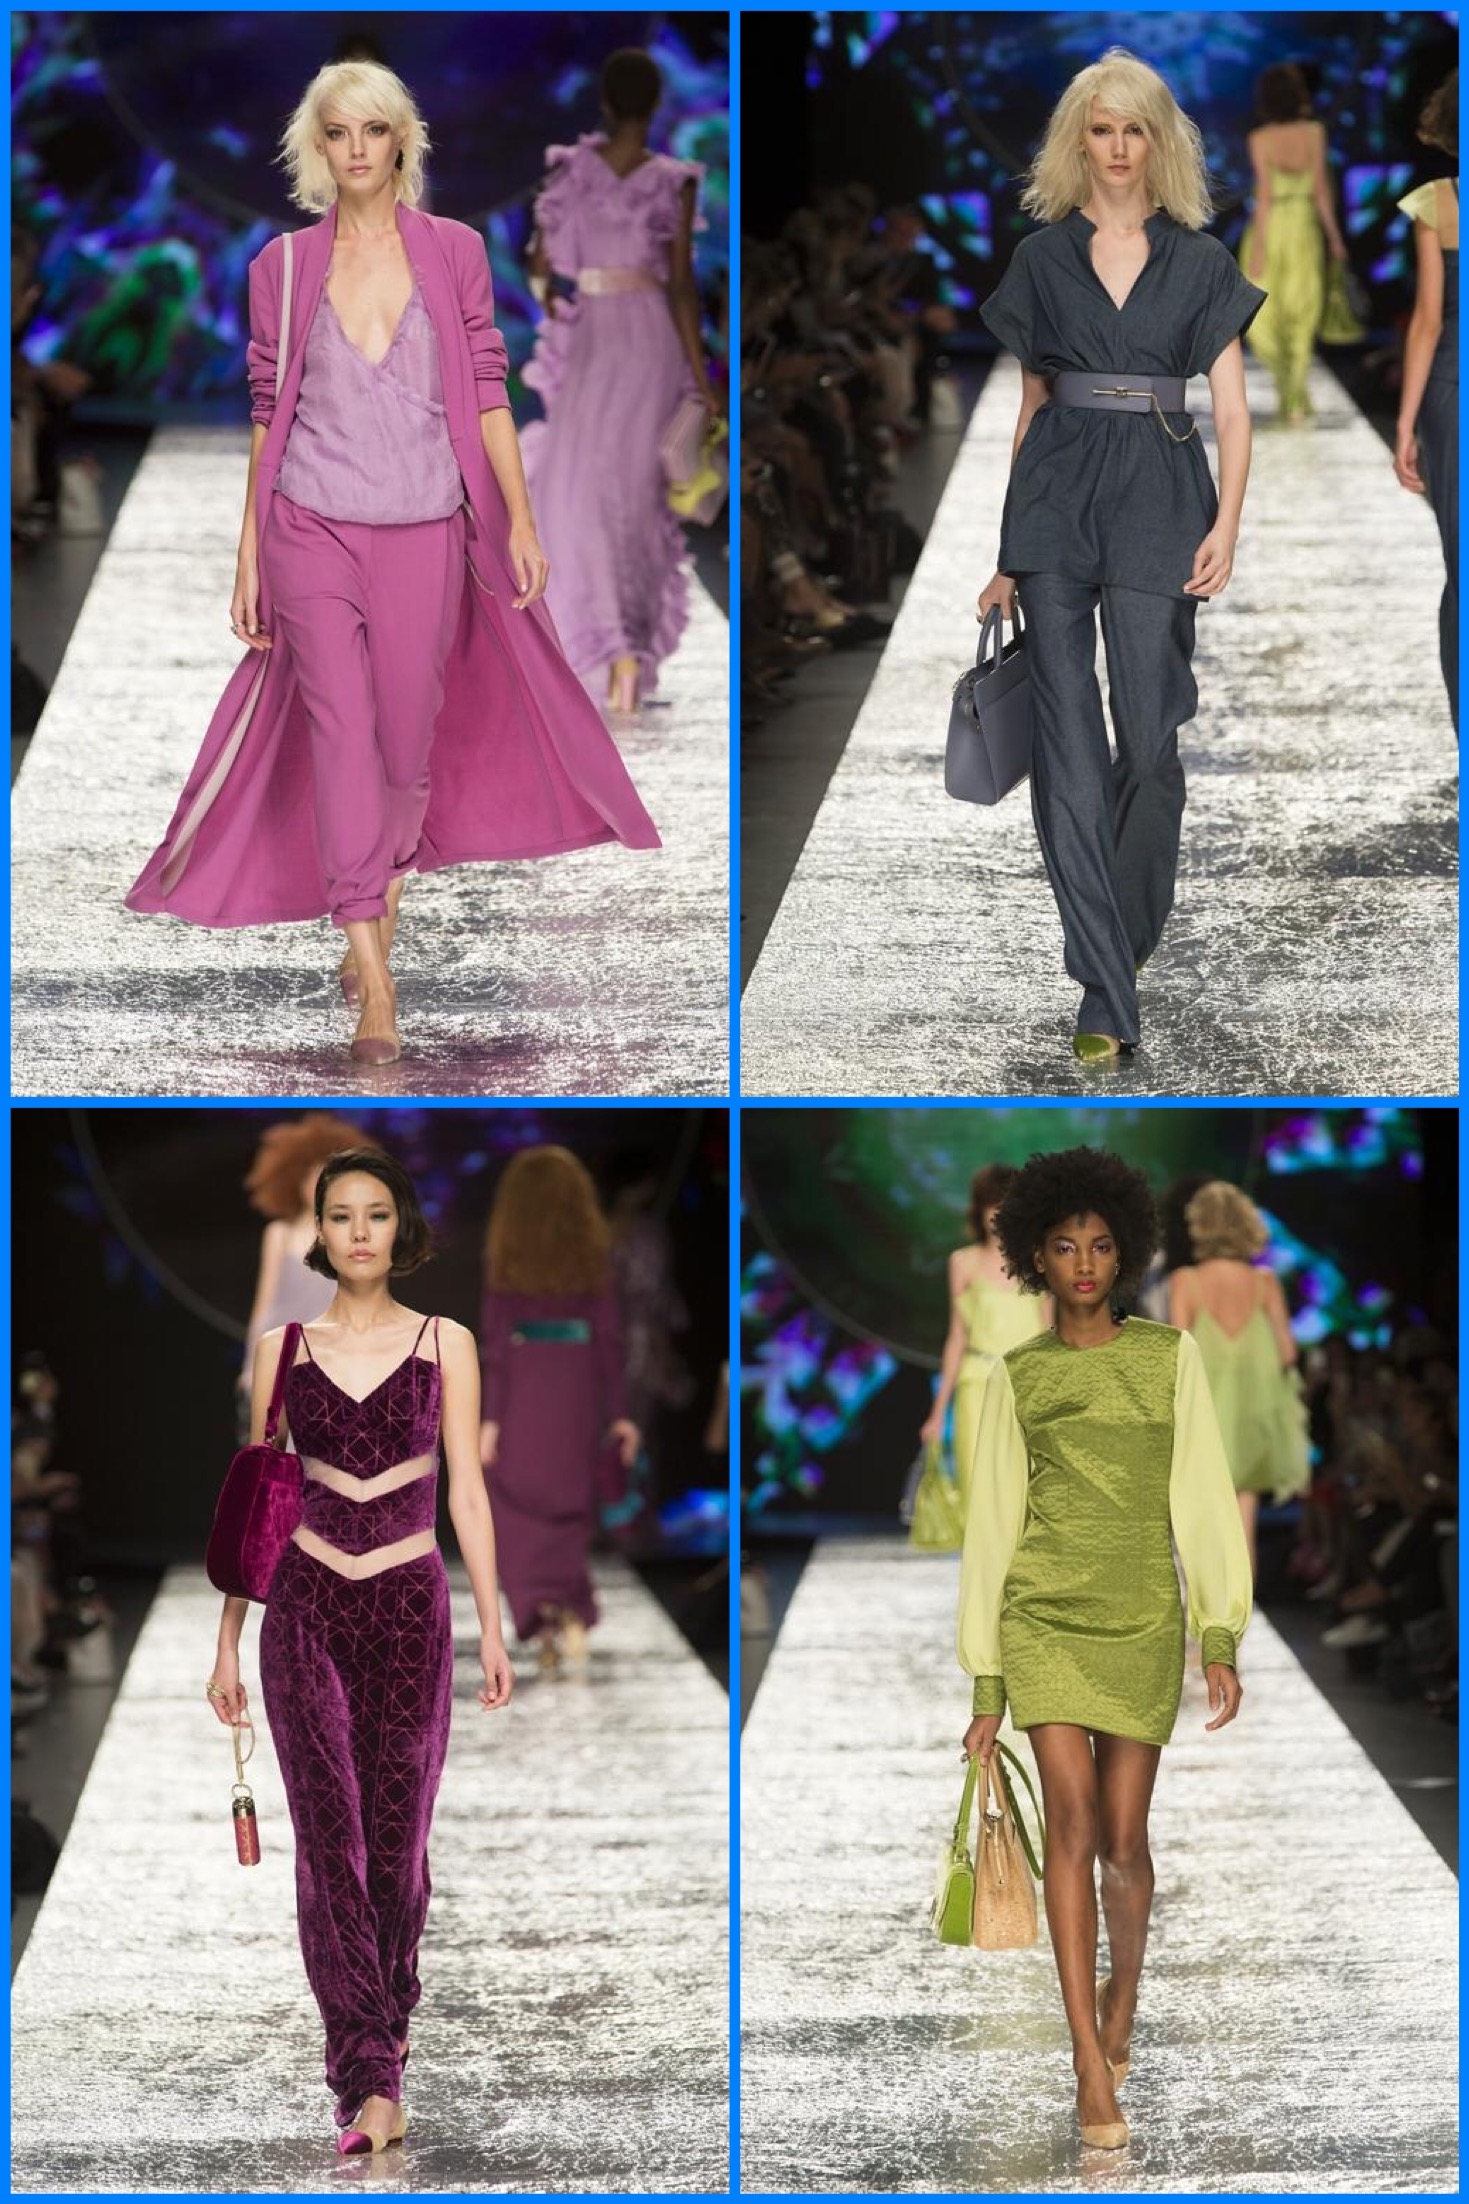 milano-fashion-week-pret-a-porter-spring-summer-2017-style-aigner